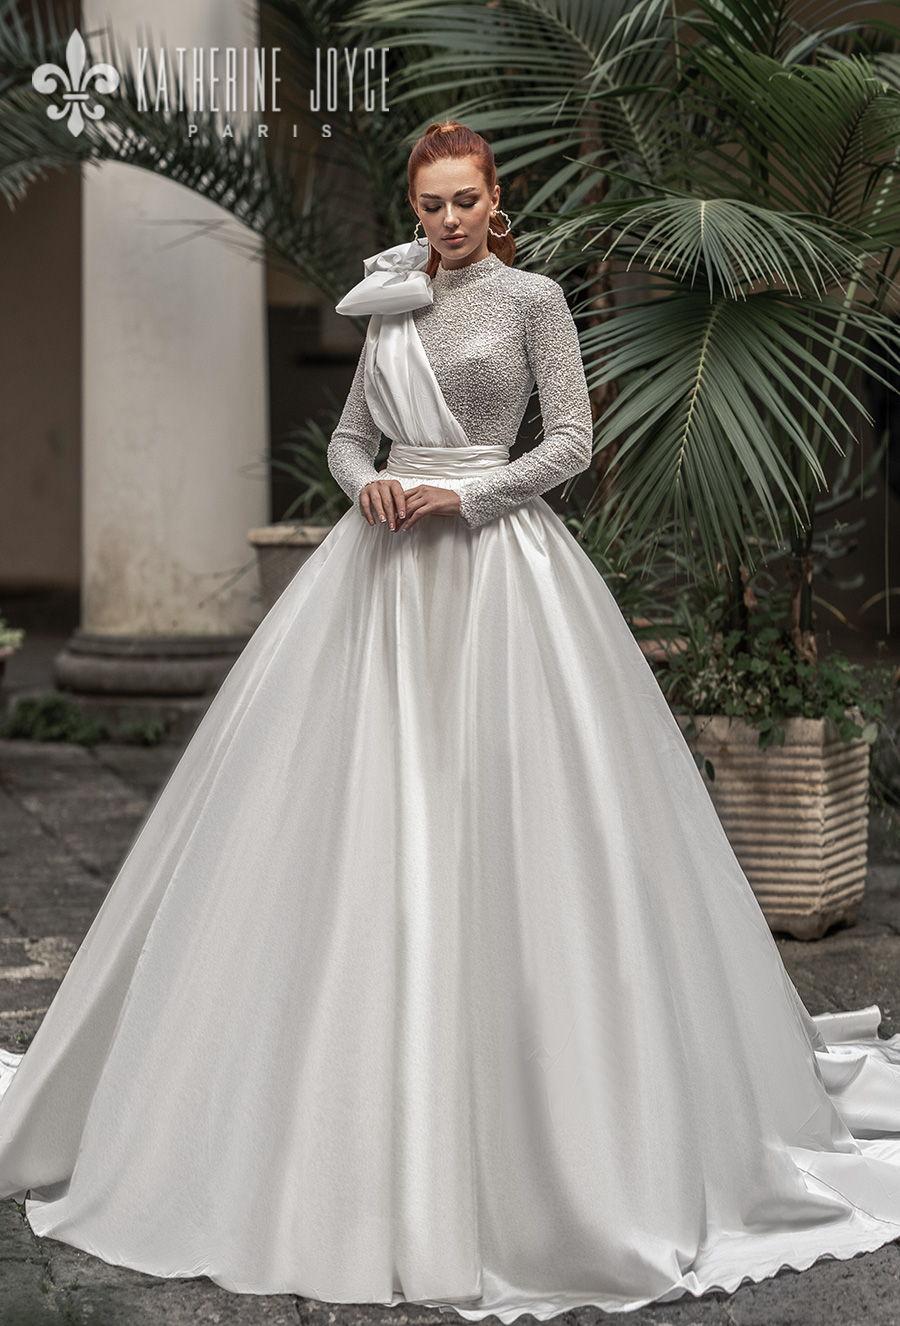 katherine joyce 2021 naples bridal long sleeves high neck full embellishment glitter glamorous ball gown wedding dress covered button back chapel train (mulan) mv